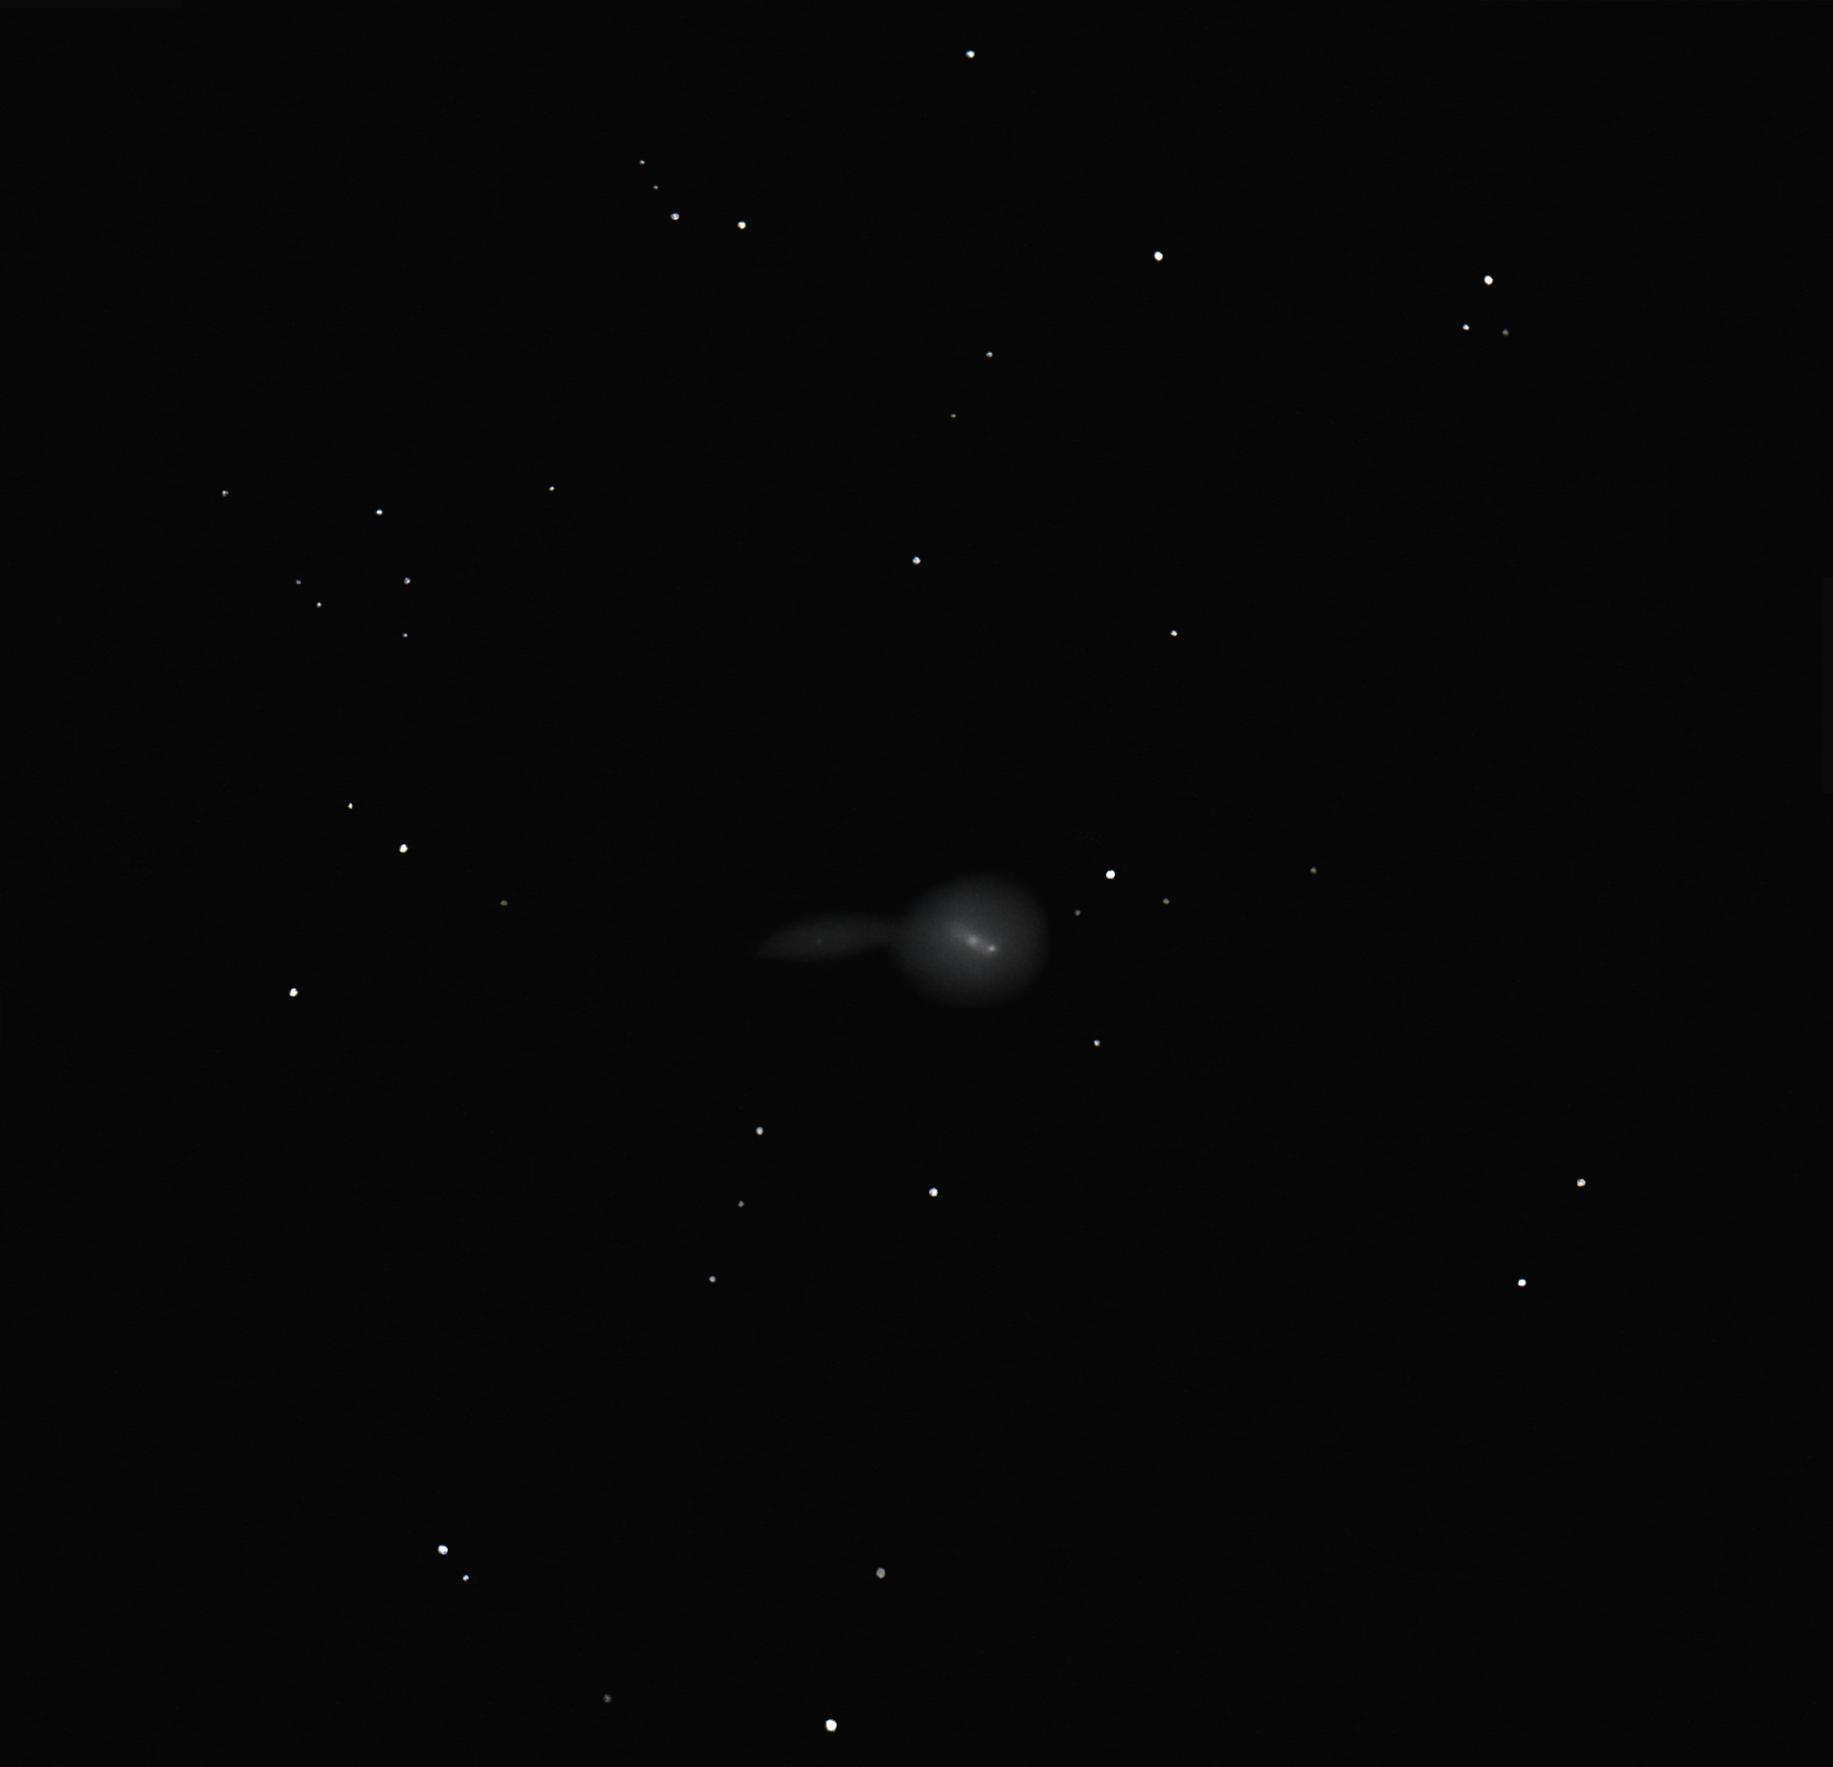 ngc 2207 galaxy